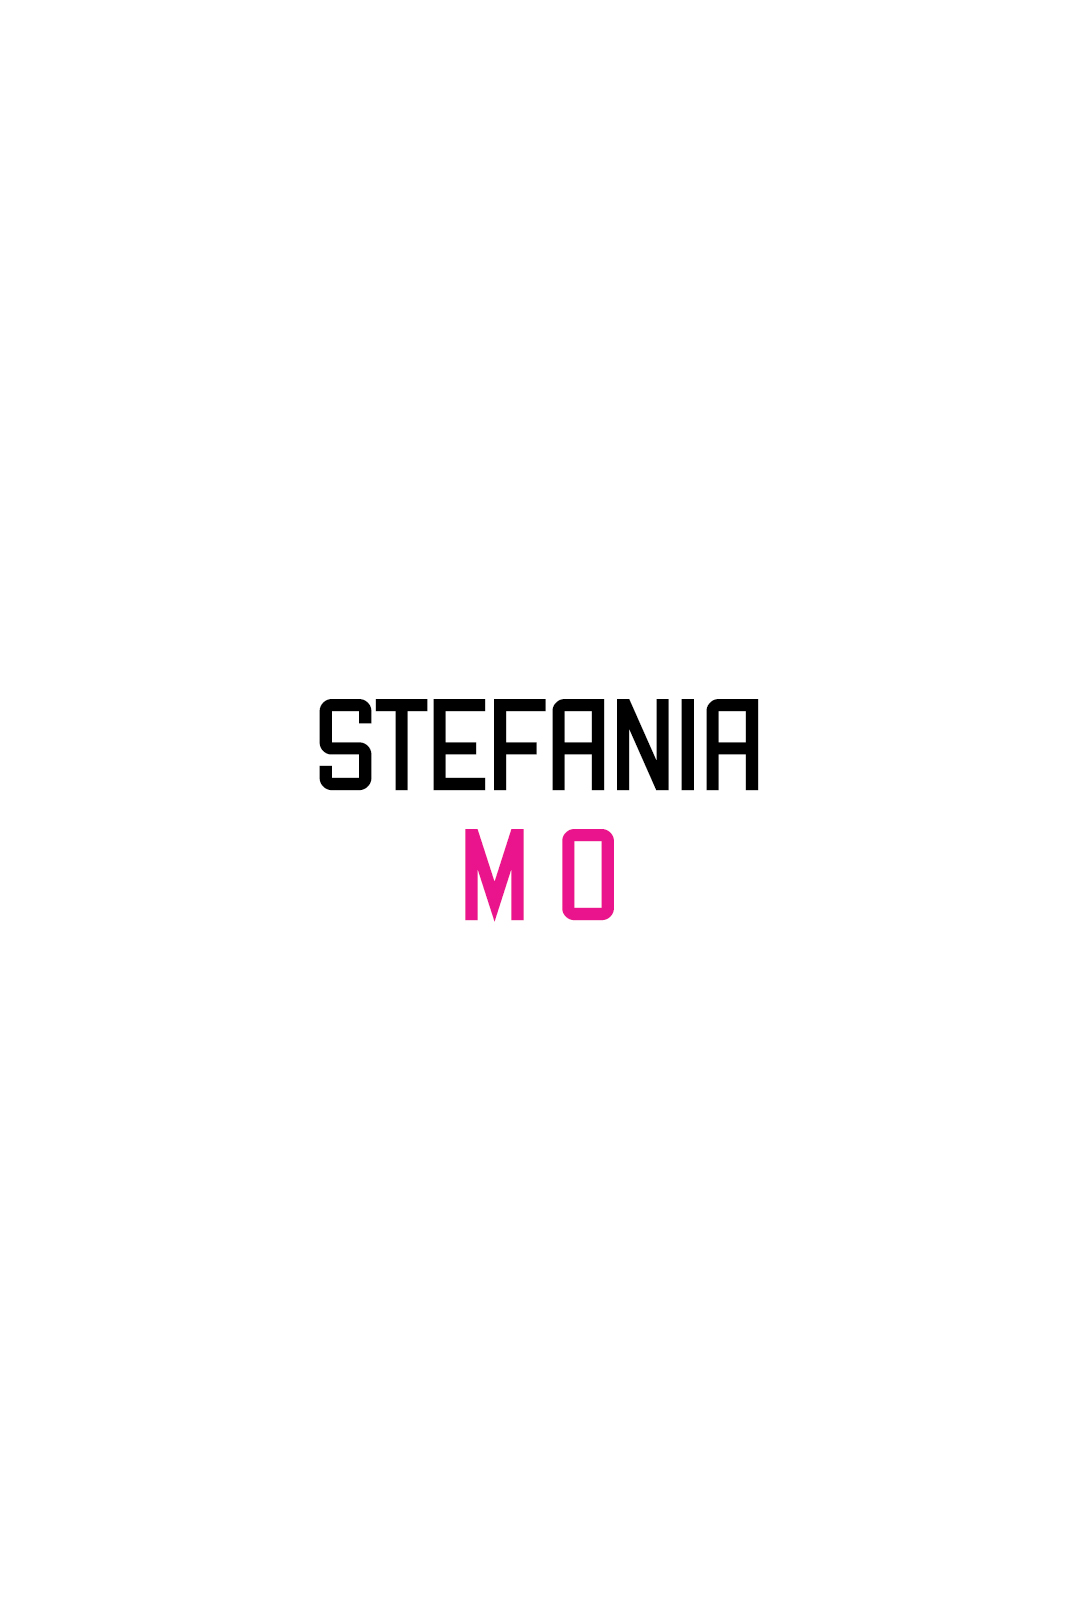 11 – Stefania Mo